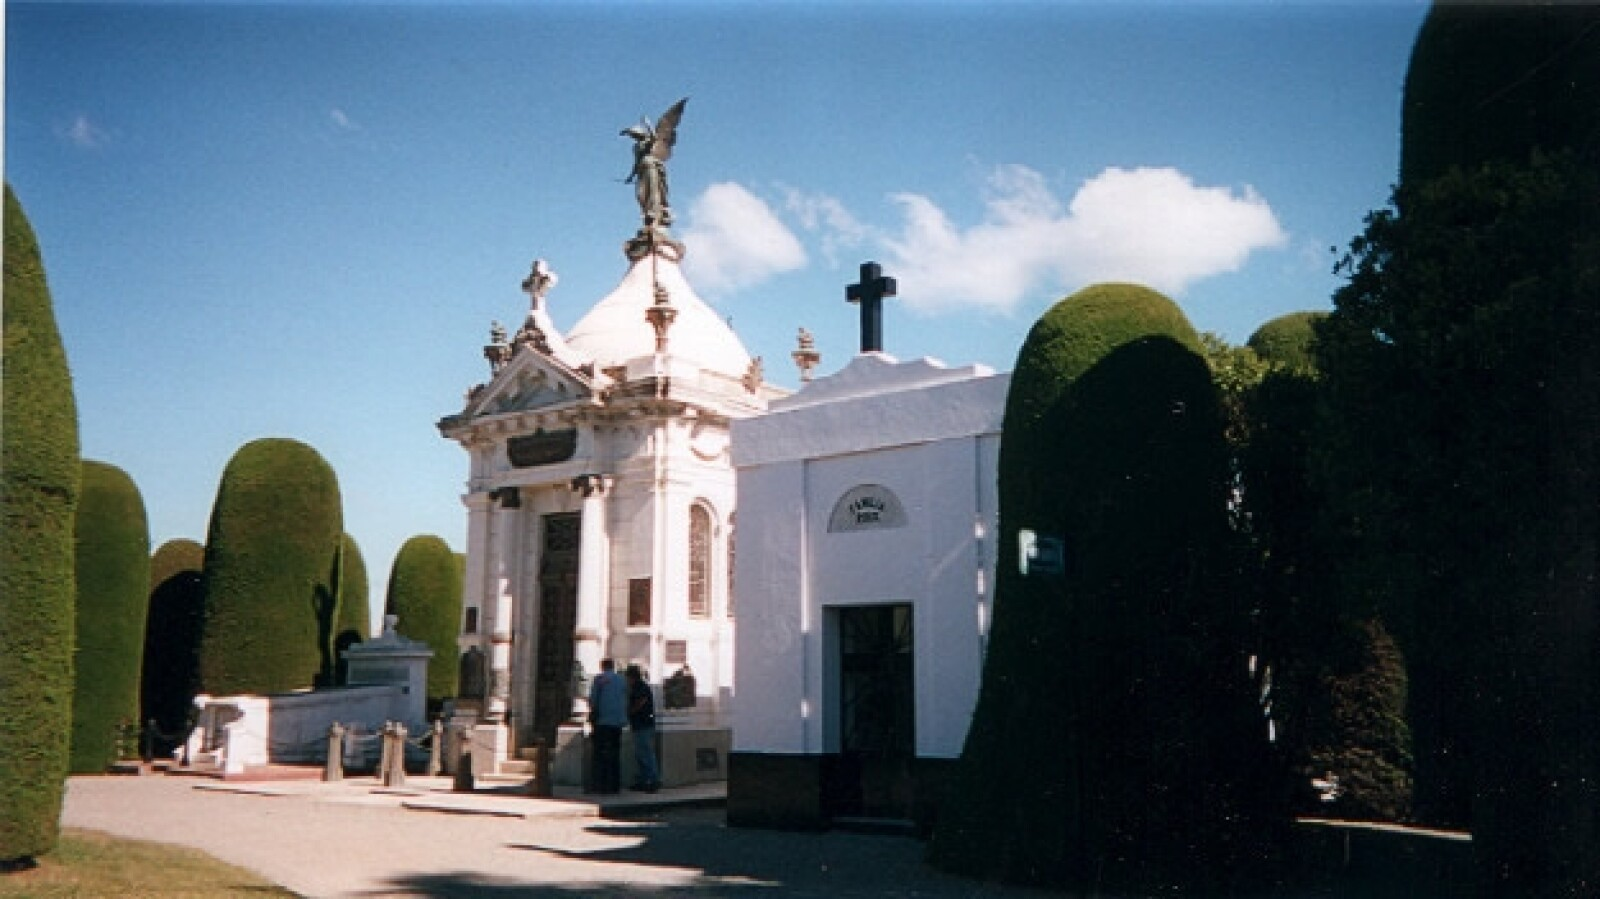 Cementerio de Punta Arenas, Chile